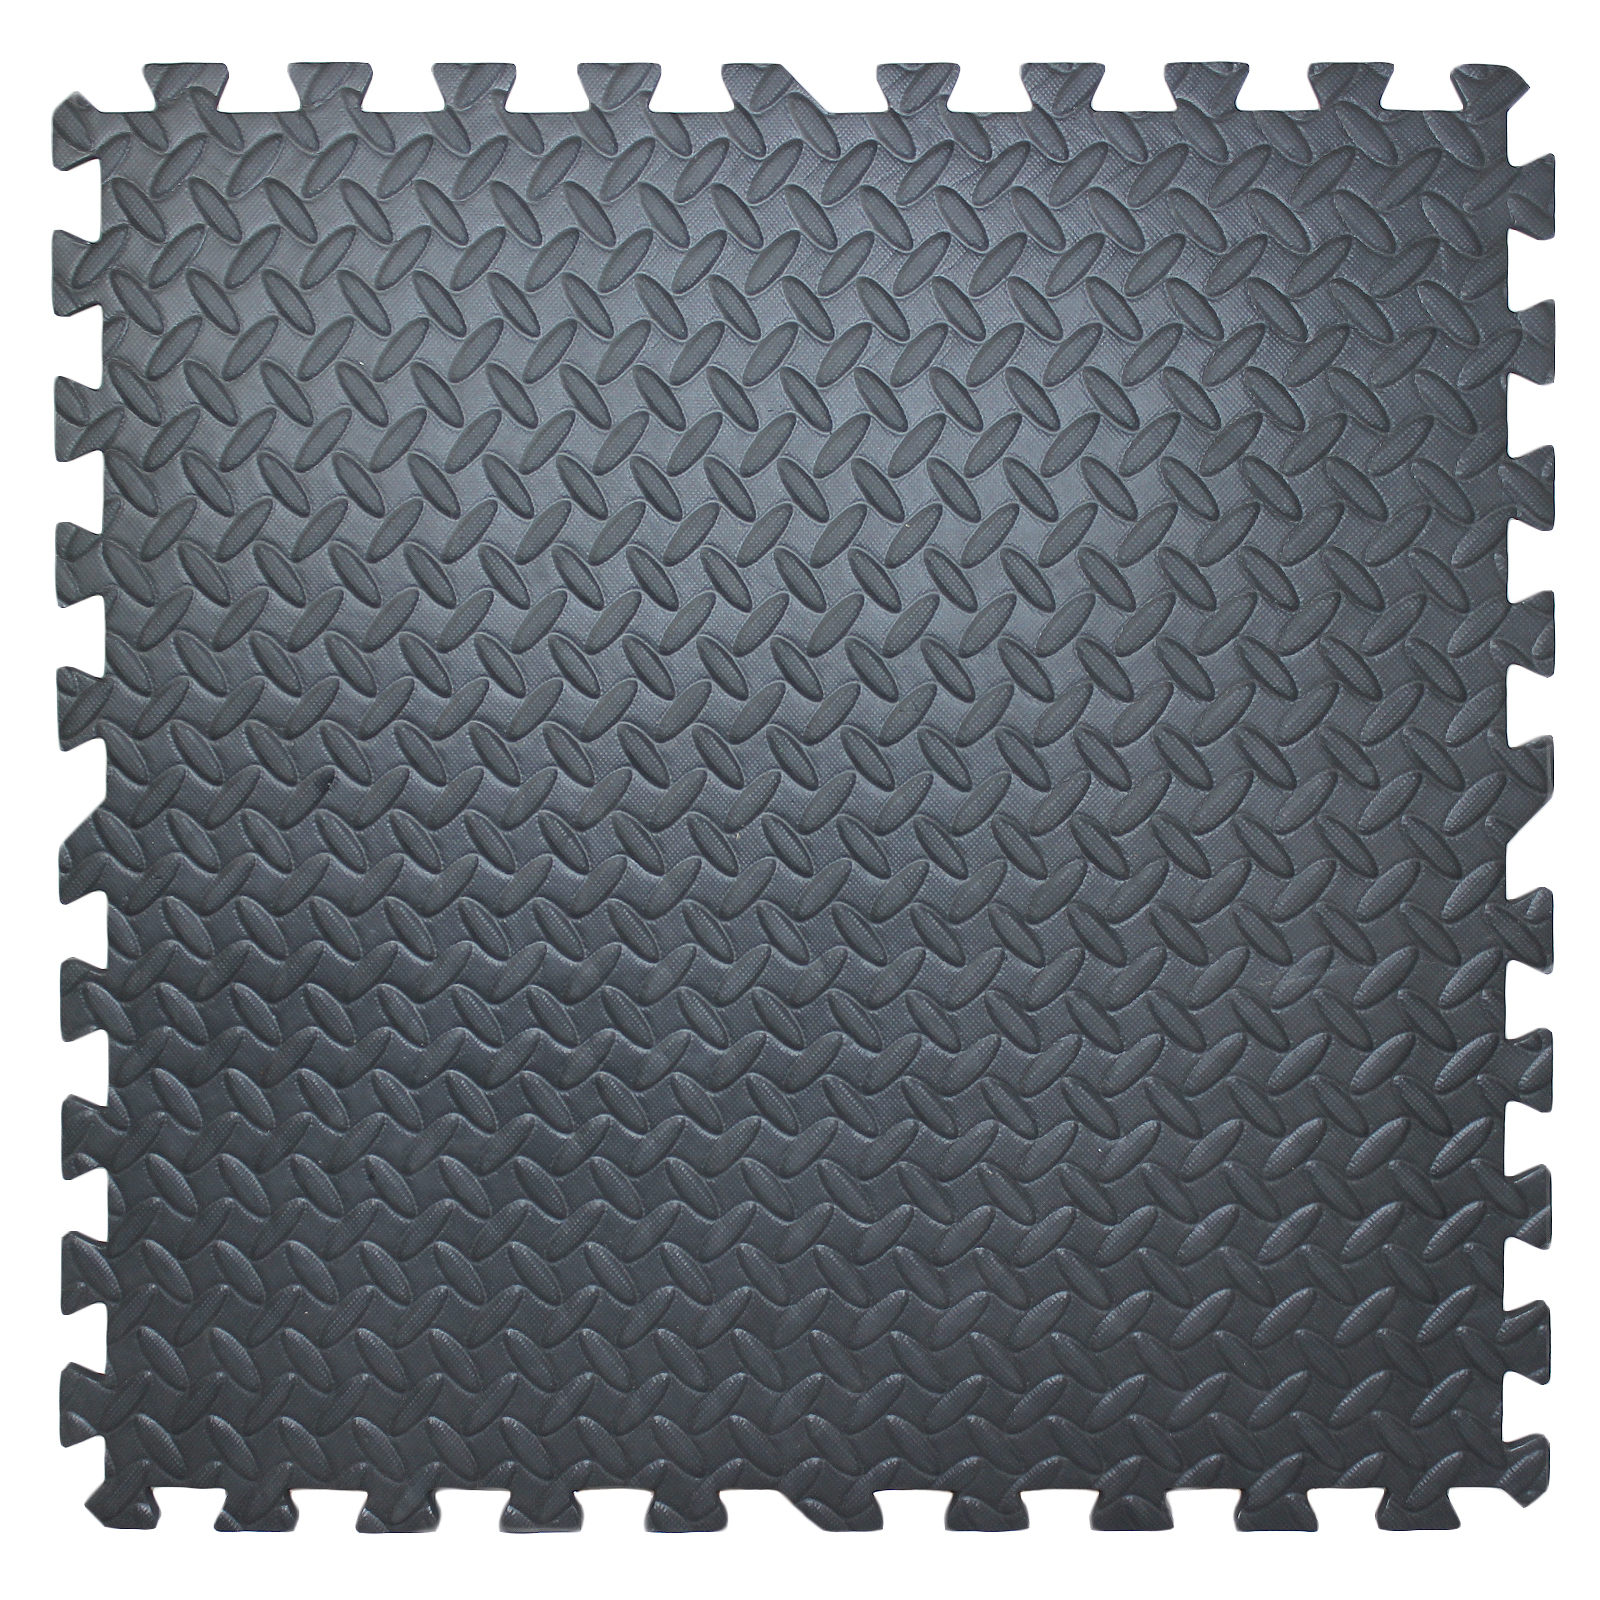 Foam Floor Mat Interlocking Play Garage Gym Soft Exercise Tiles Set Of